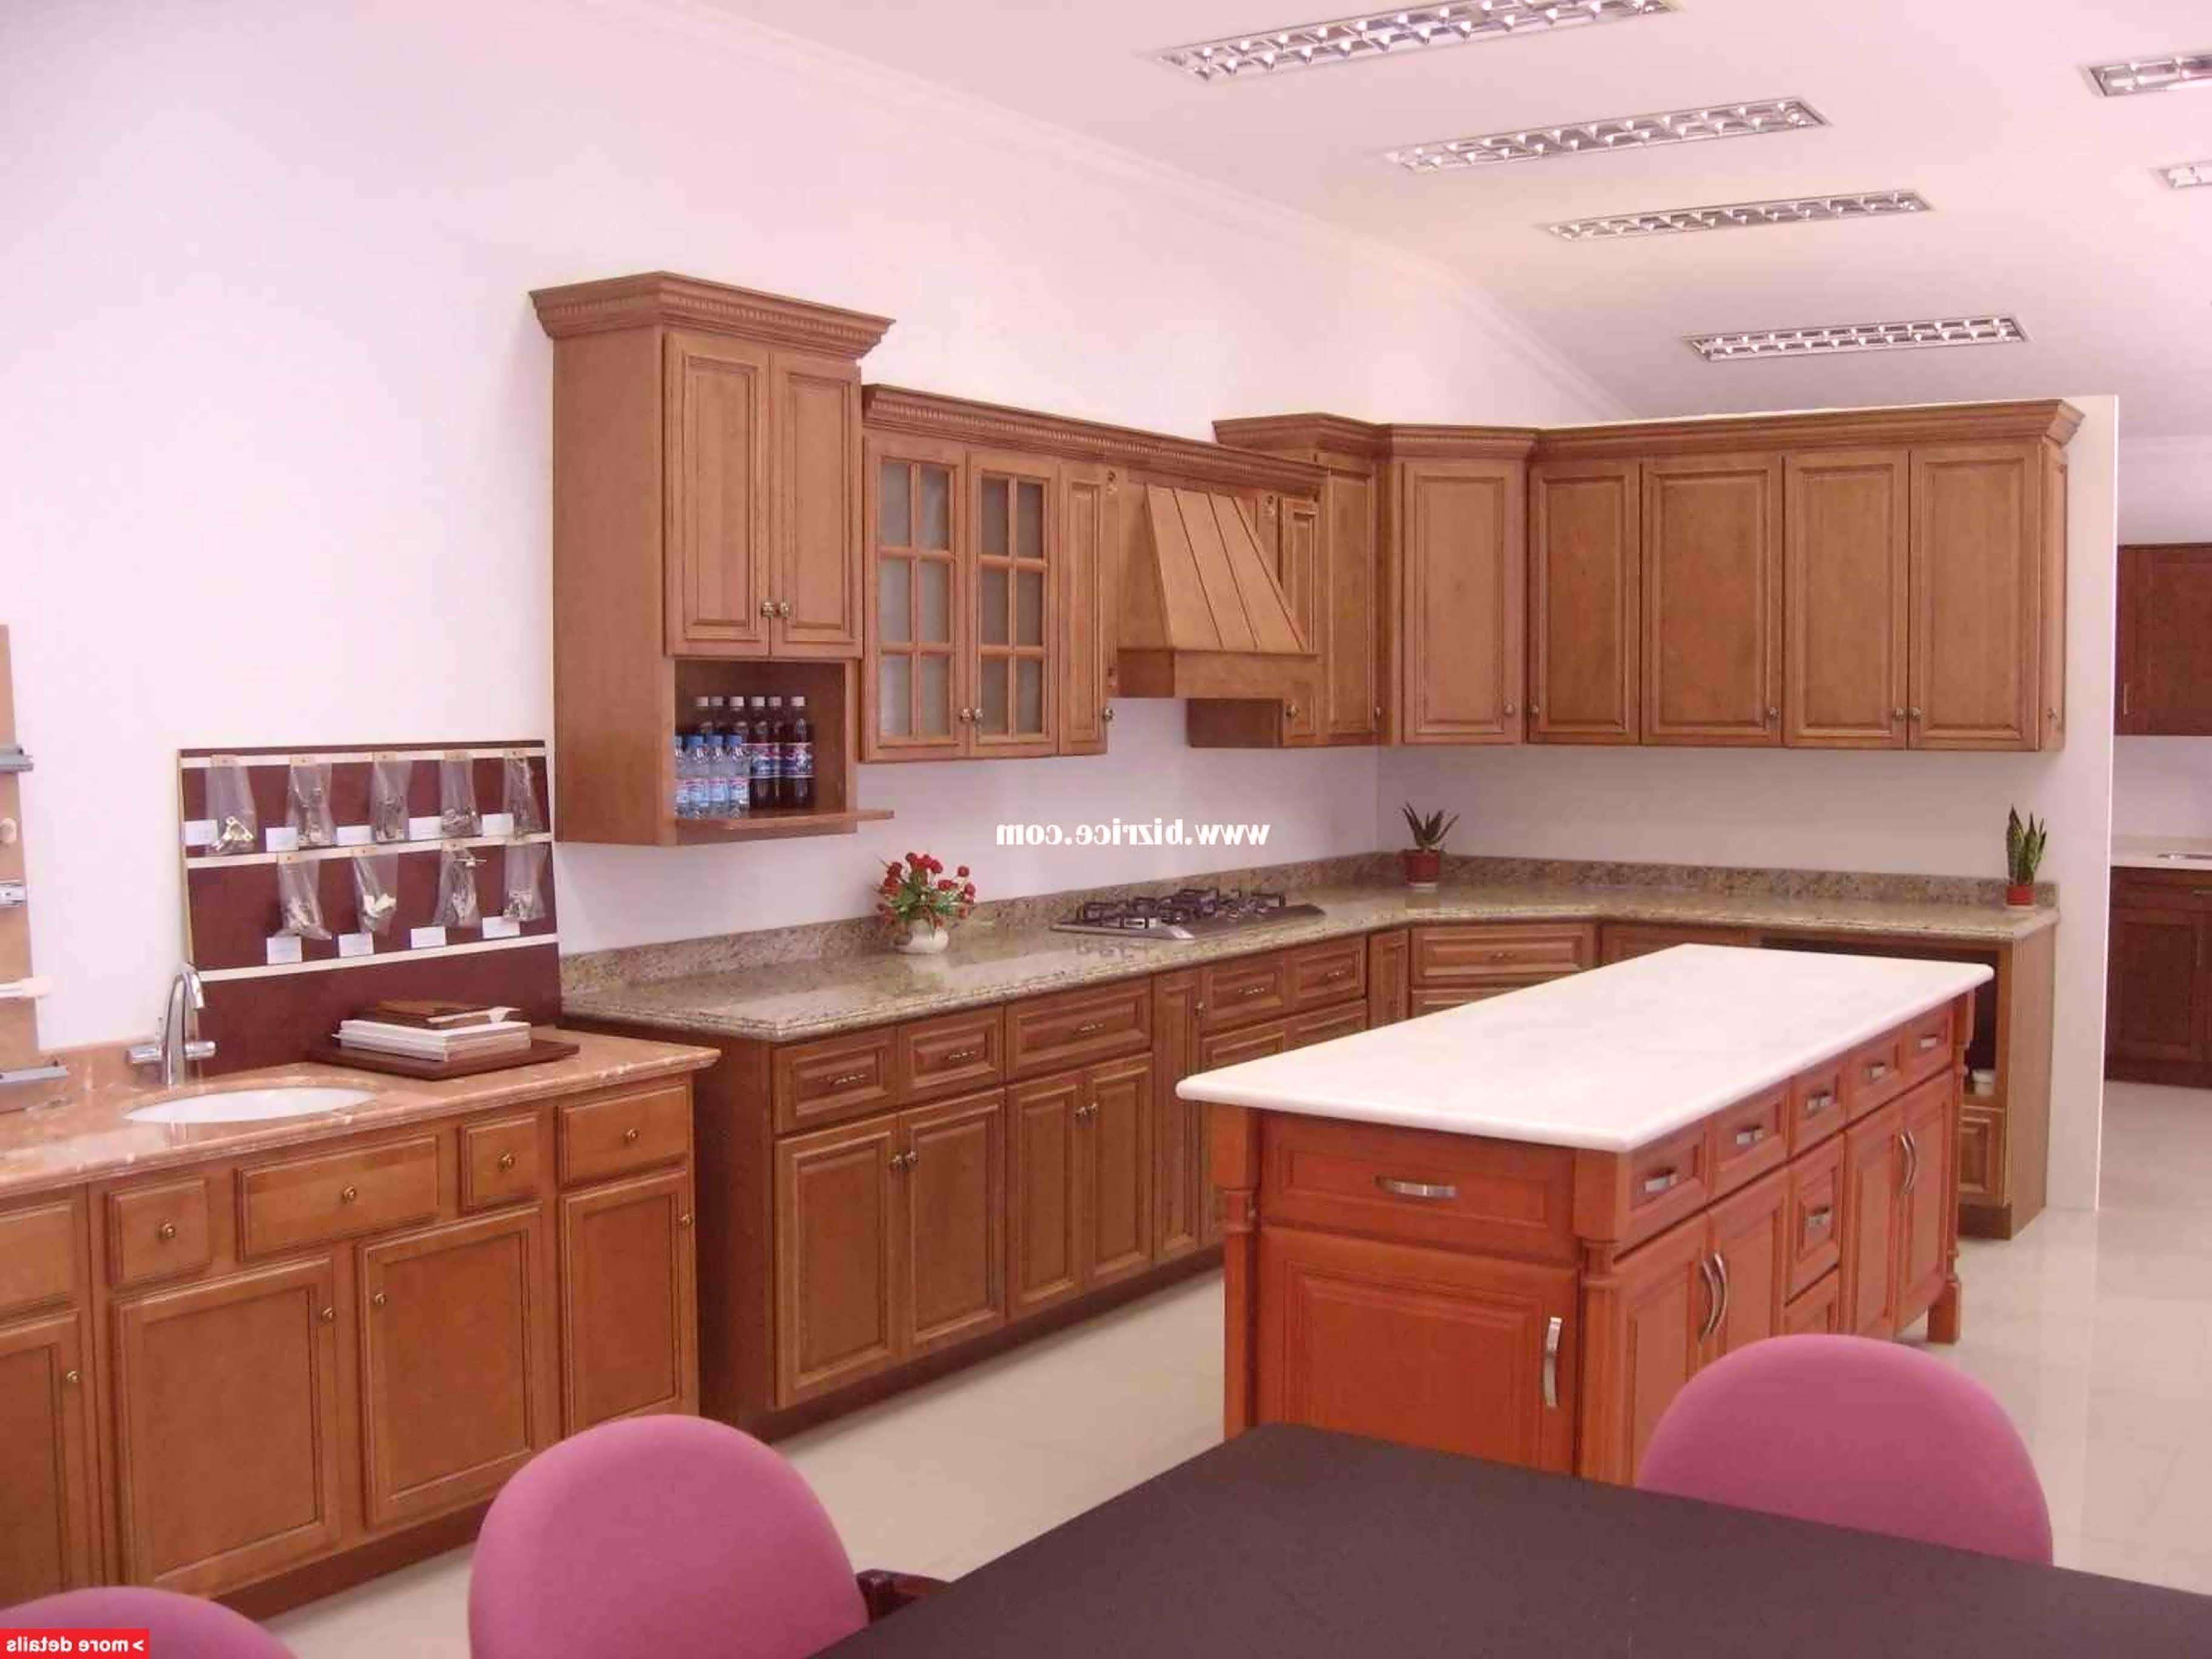 Gebrauchte Küche, Schränke Küche, Schränke Küche Kabinett ...